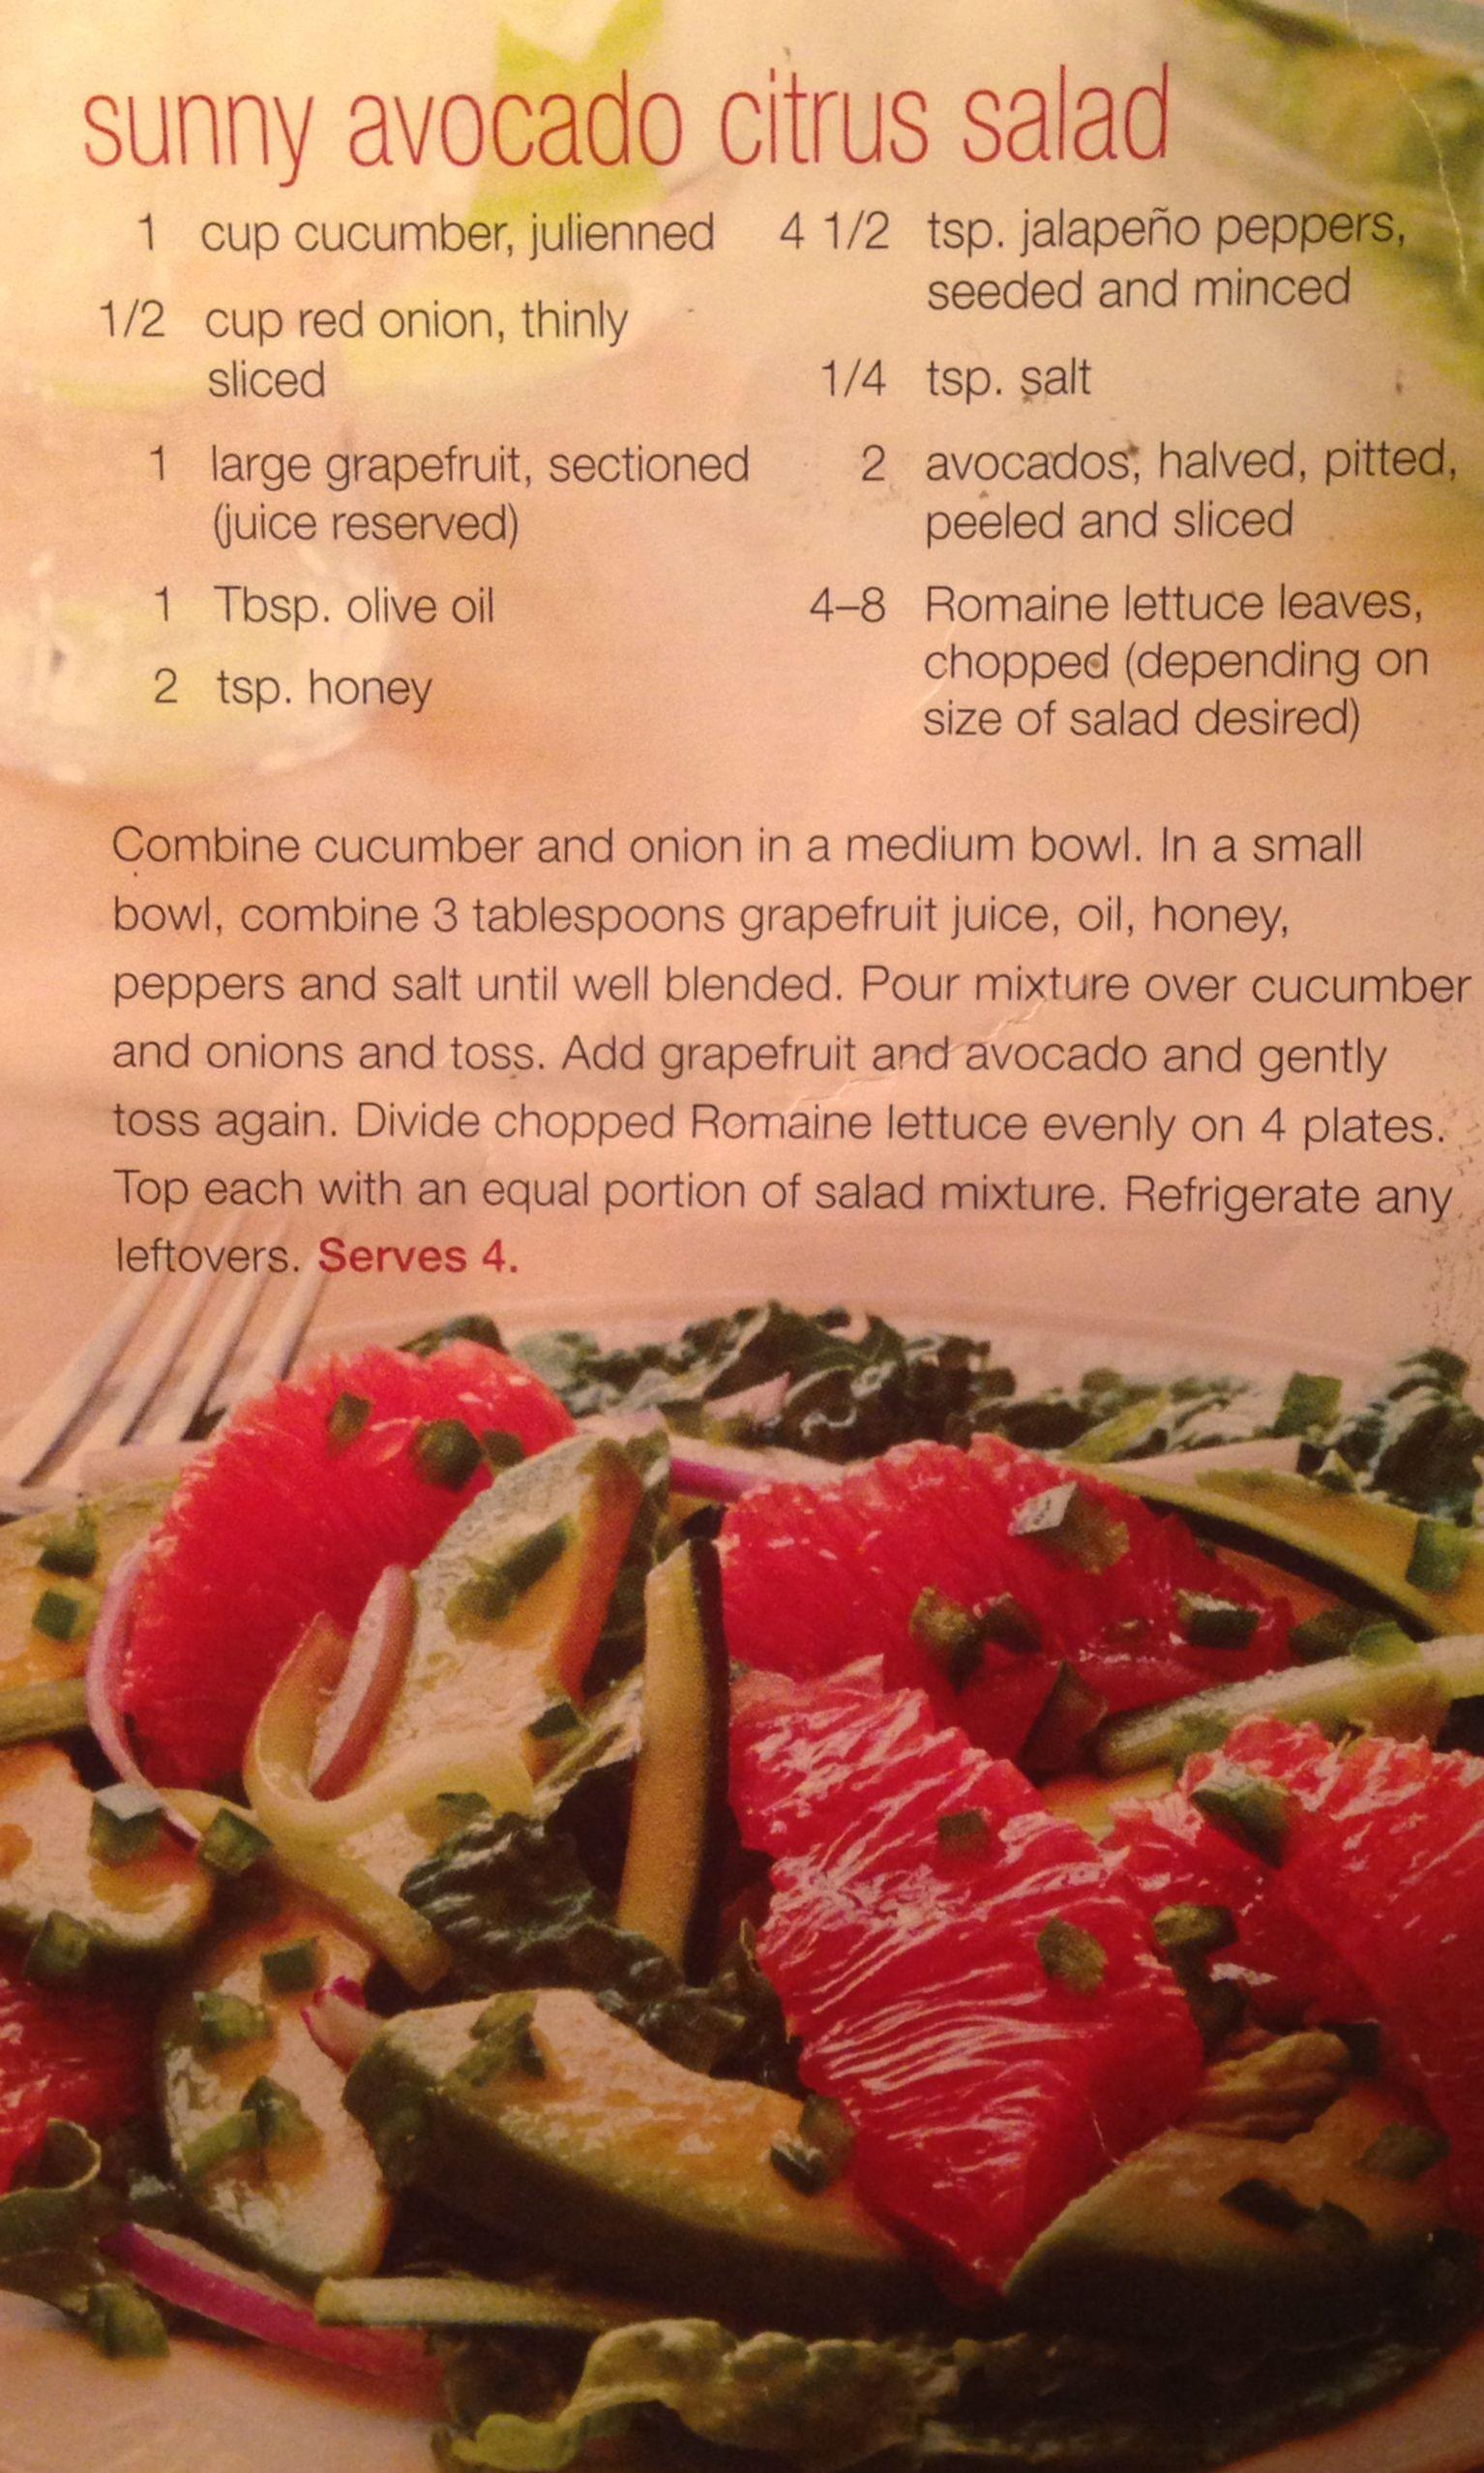 Sunny Avocado Citrus Salad | Pro tie and produce | Pinterest